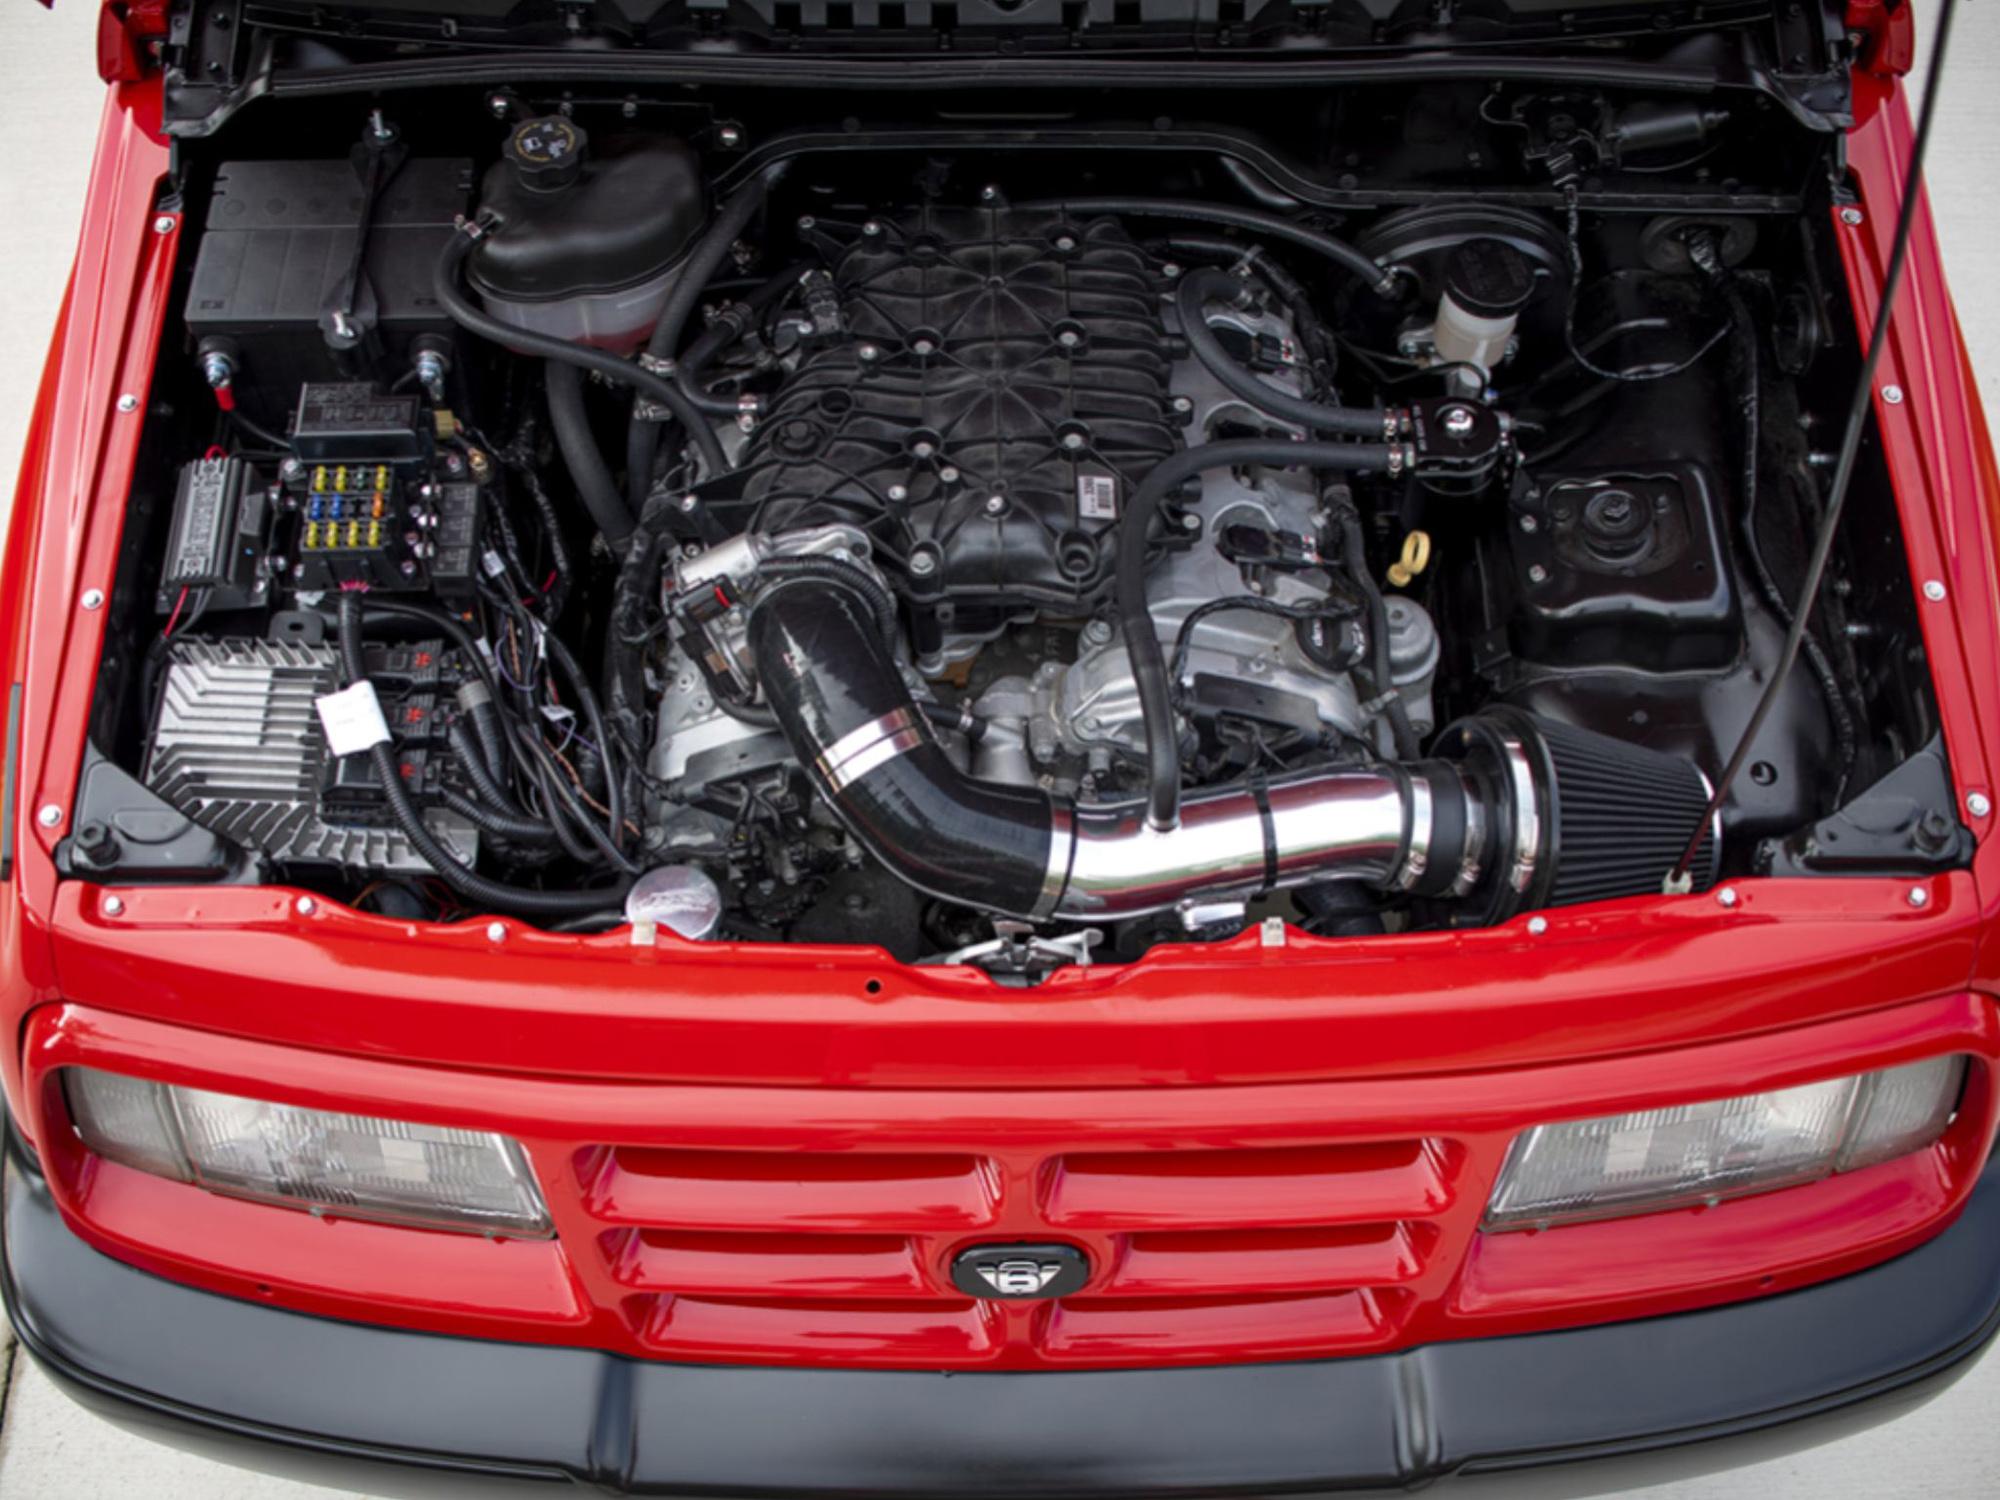 Motor do Geo Tracker vermelho